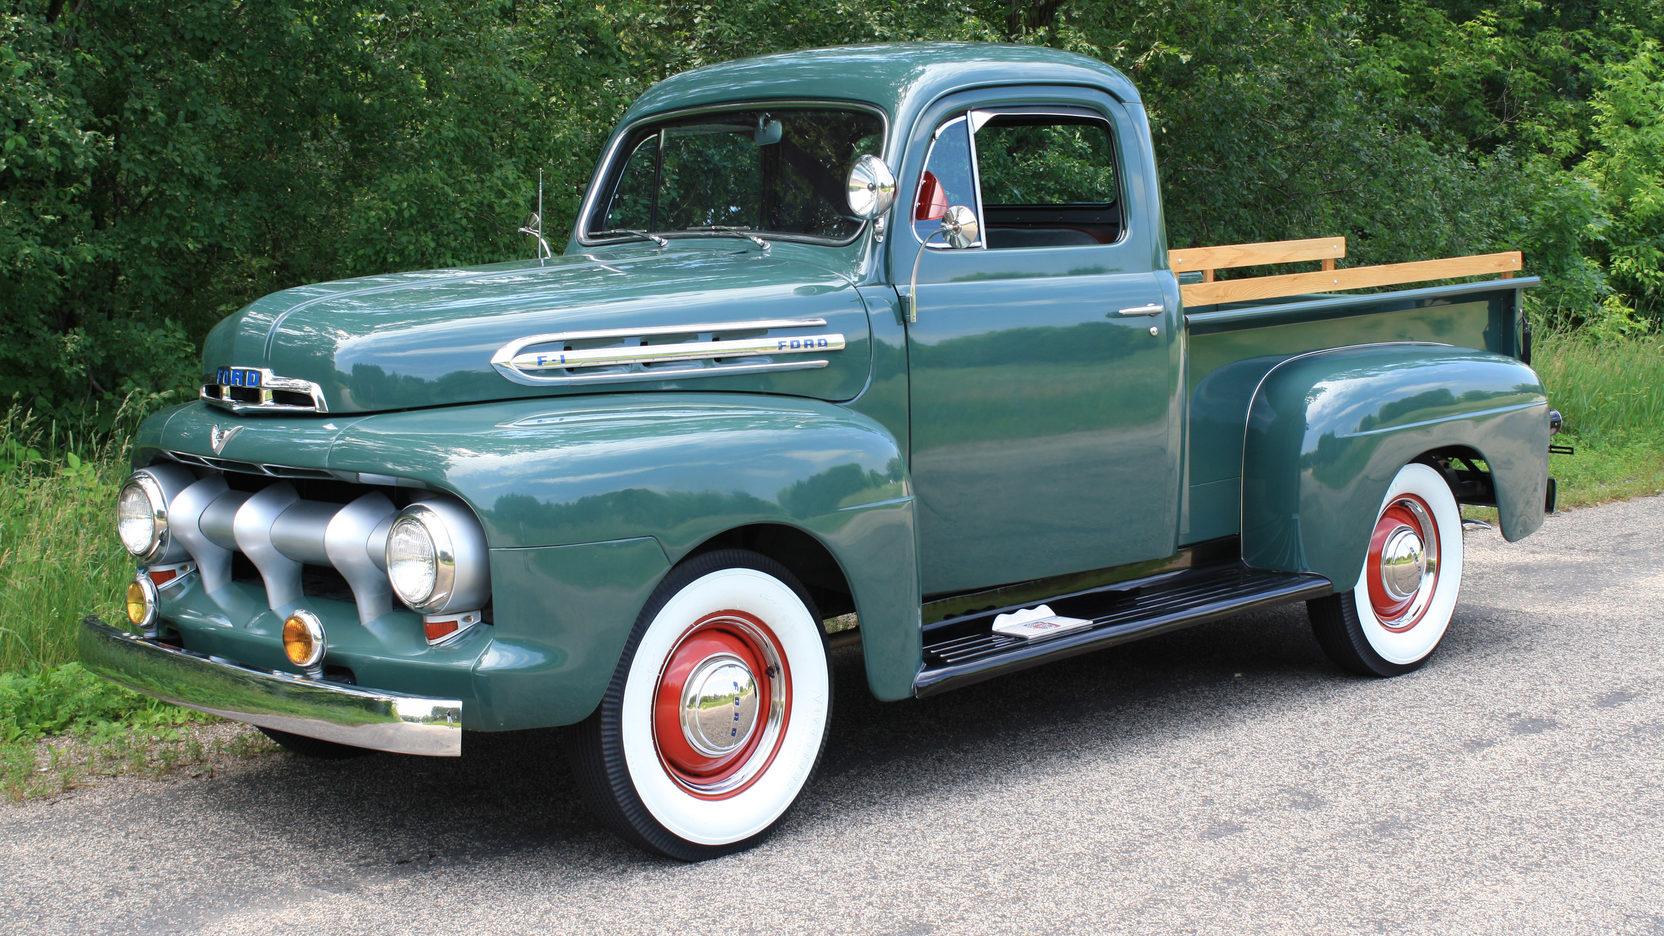 1951 Ford F1 truck